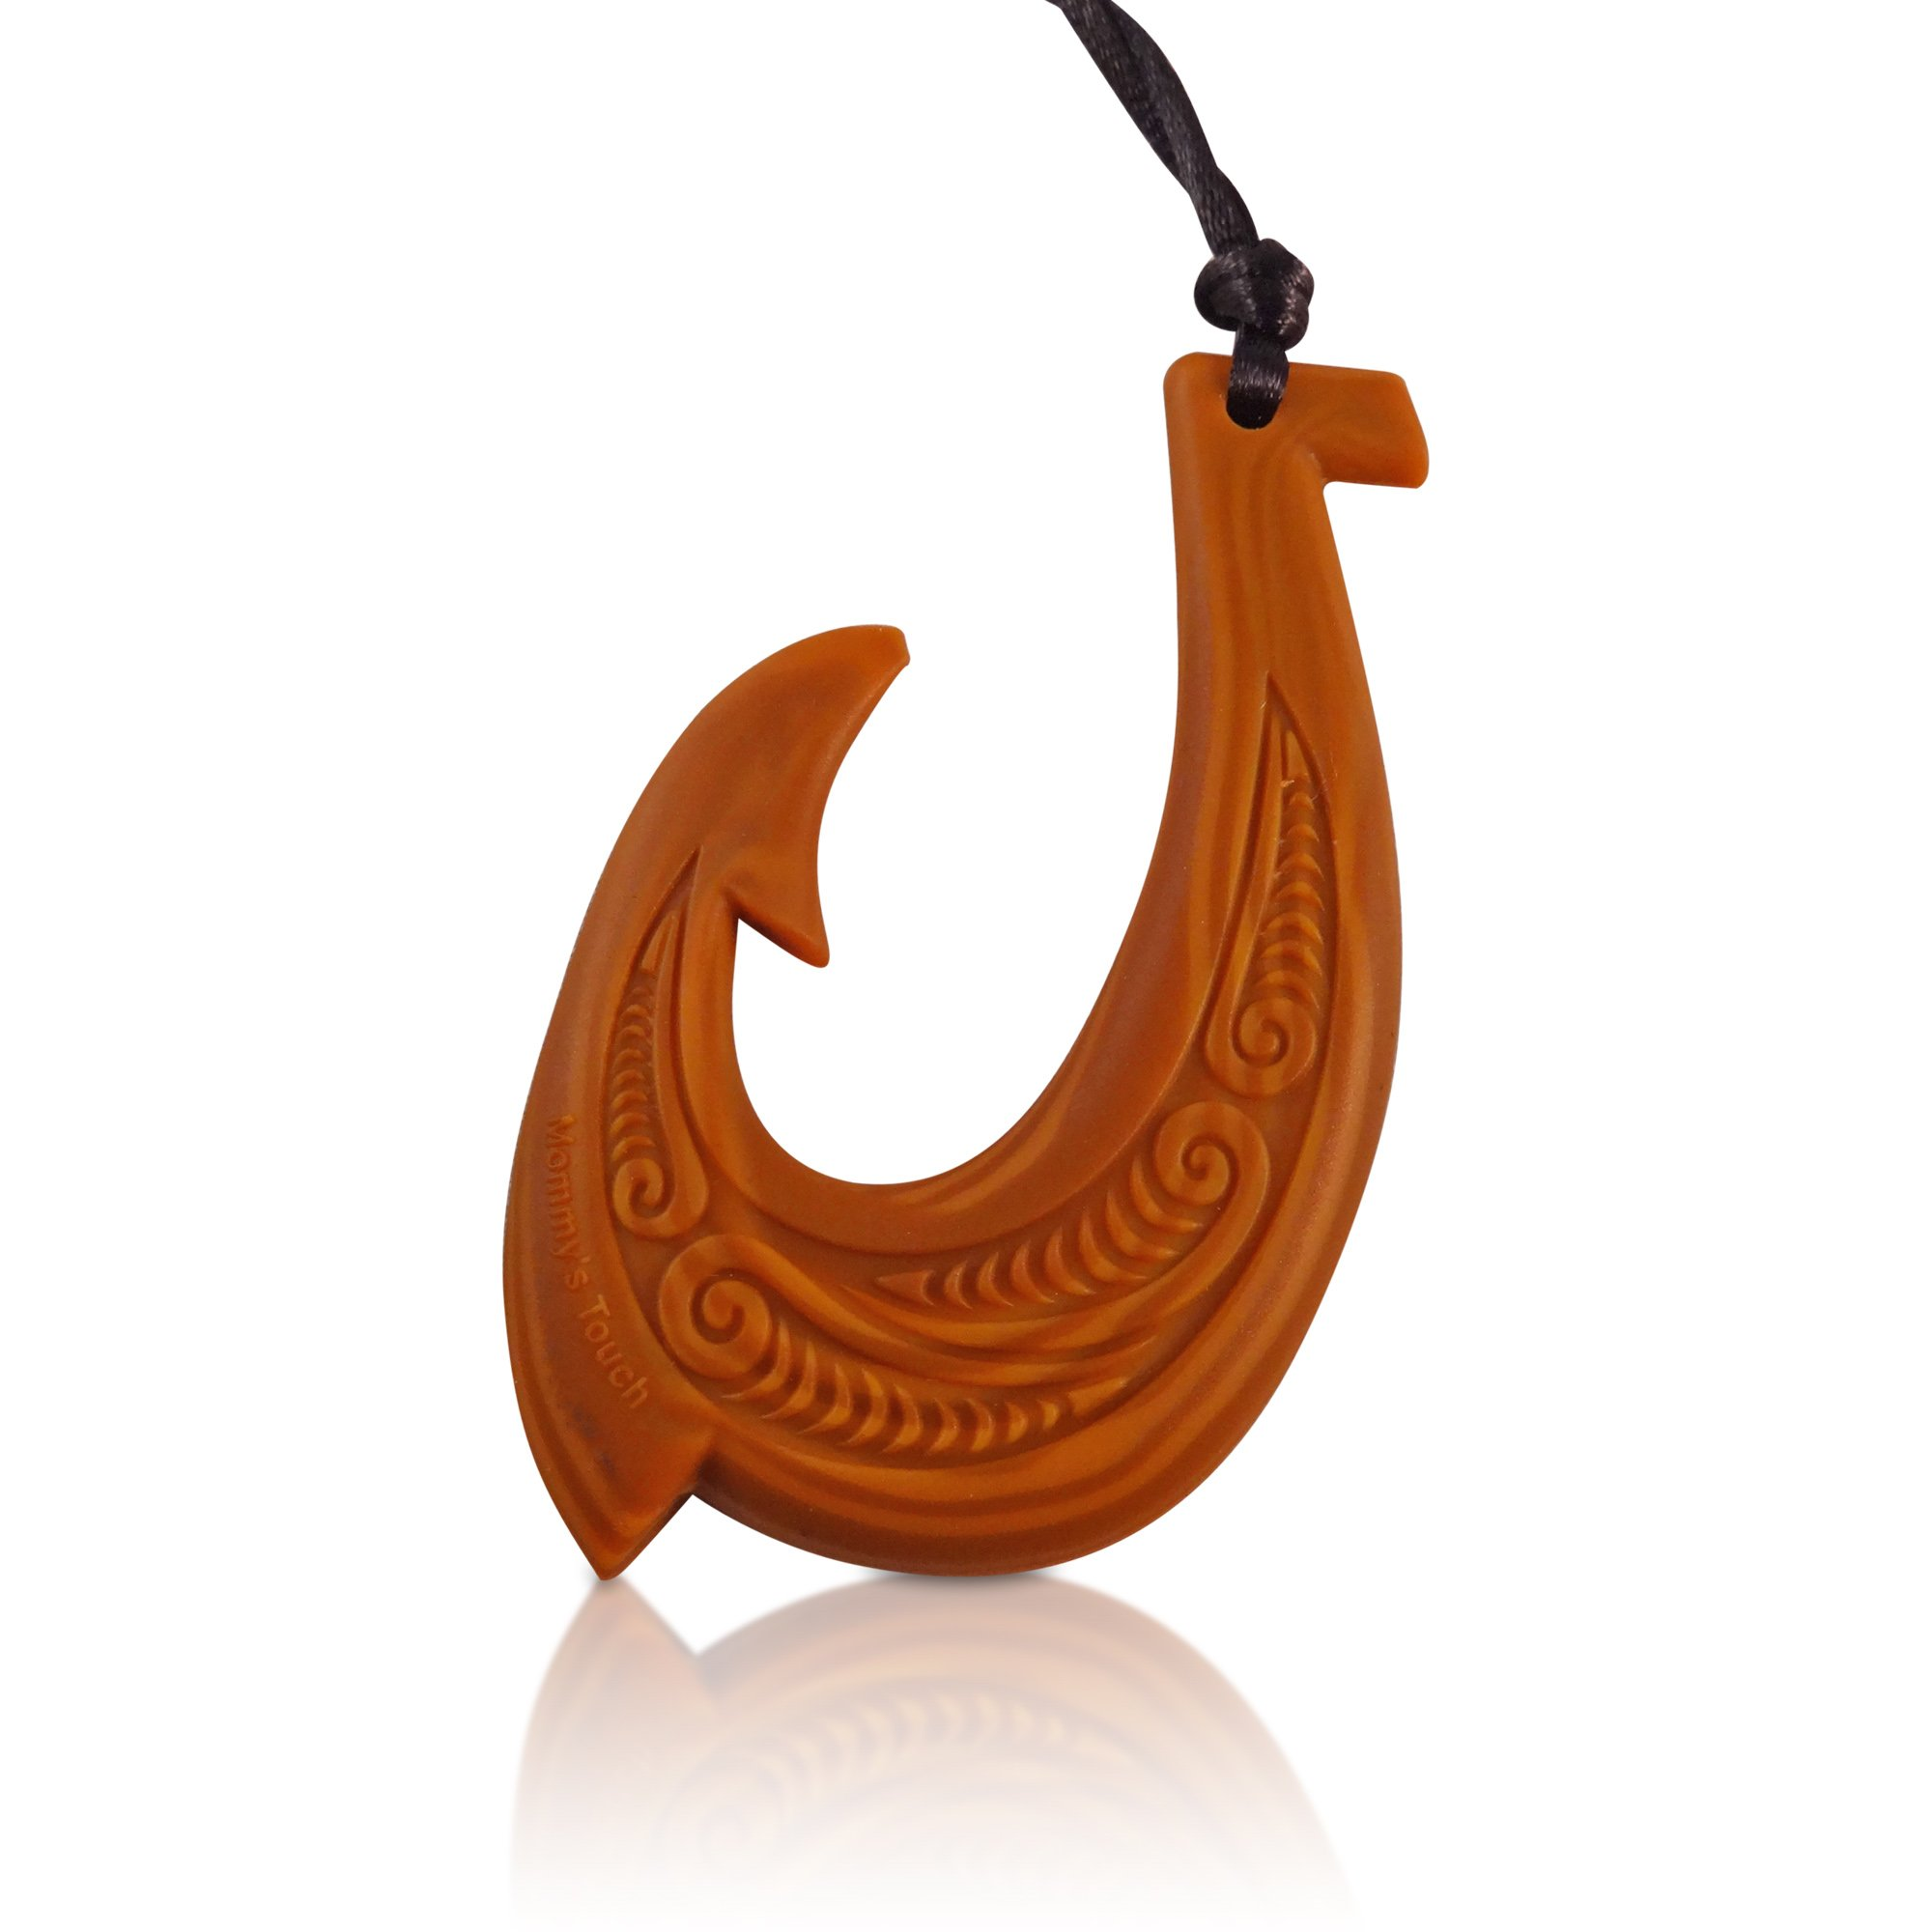 Hawaiian Fish Hook Sensory Pendant Silicone Teething Necklace, BPA Free Chewy Makau Teether (Wood Design)